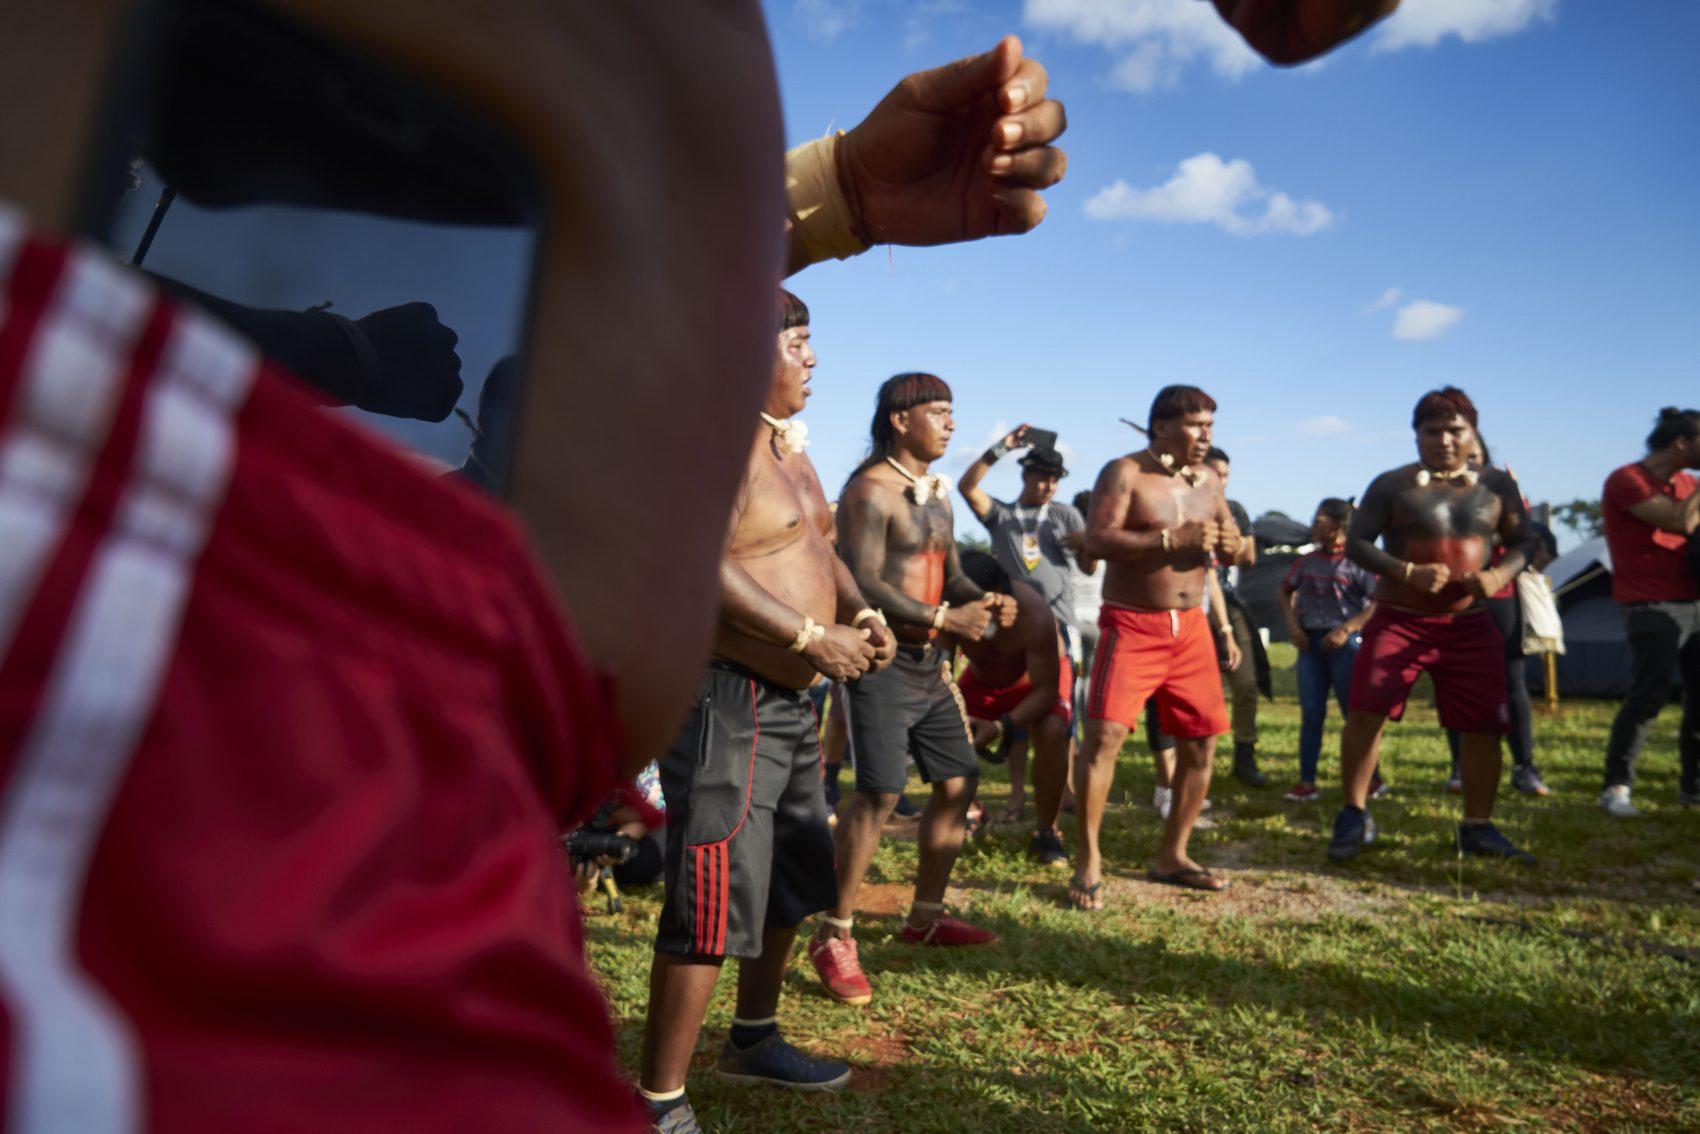 15 Acampamento Terra Livre, Brasília 2019